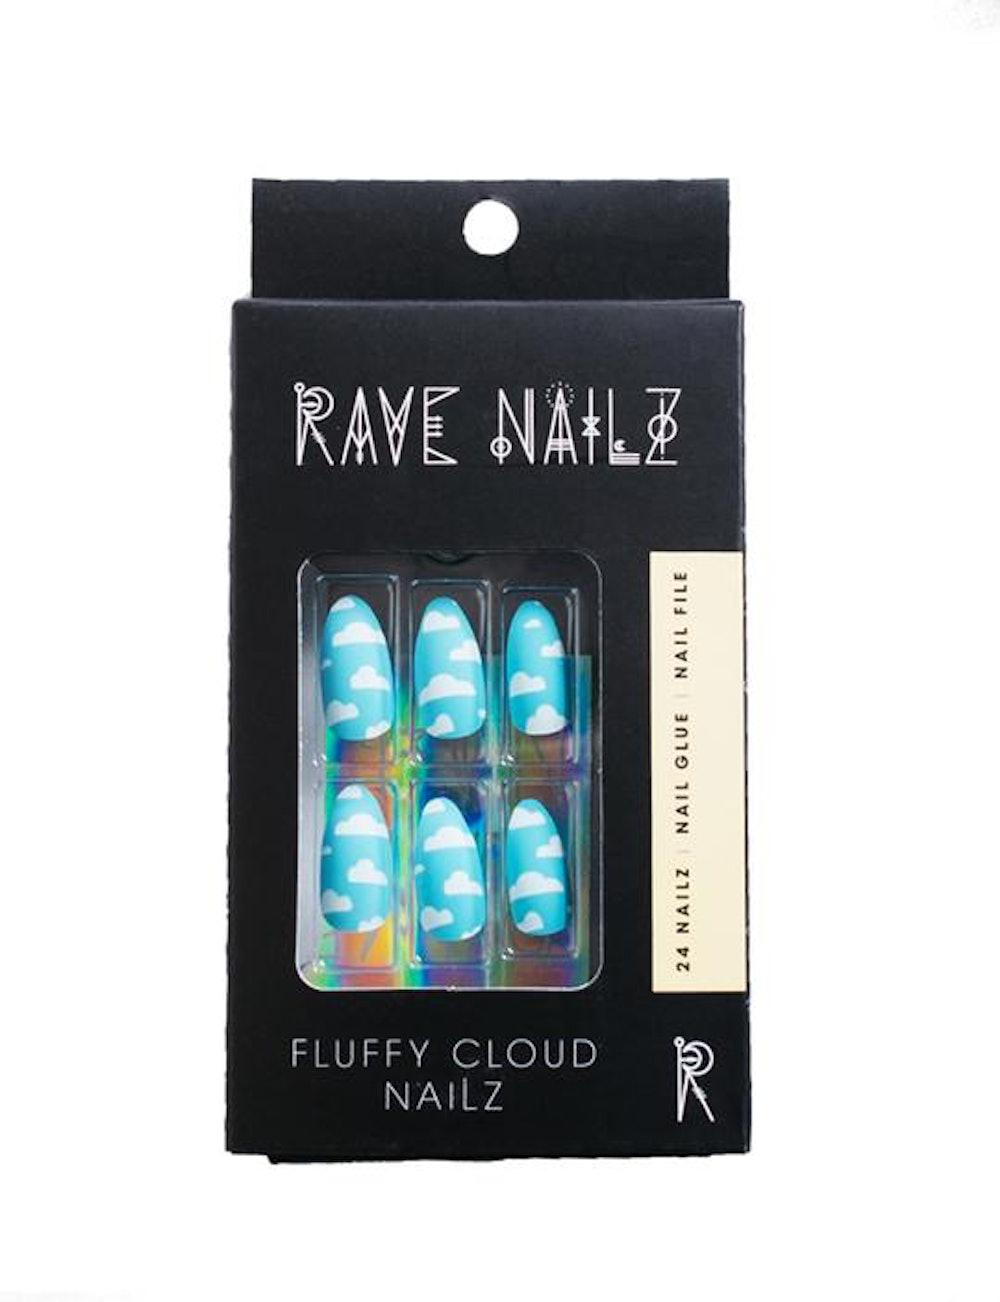 Fluffy Cloud Nailz